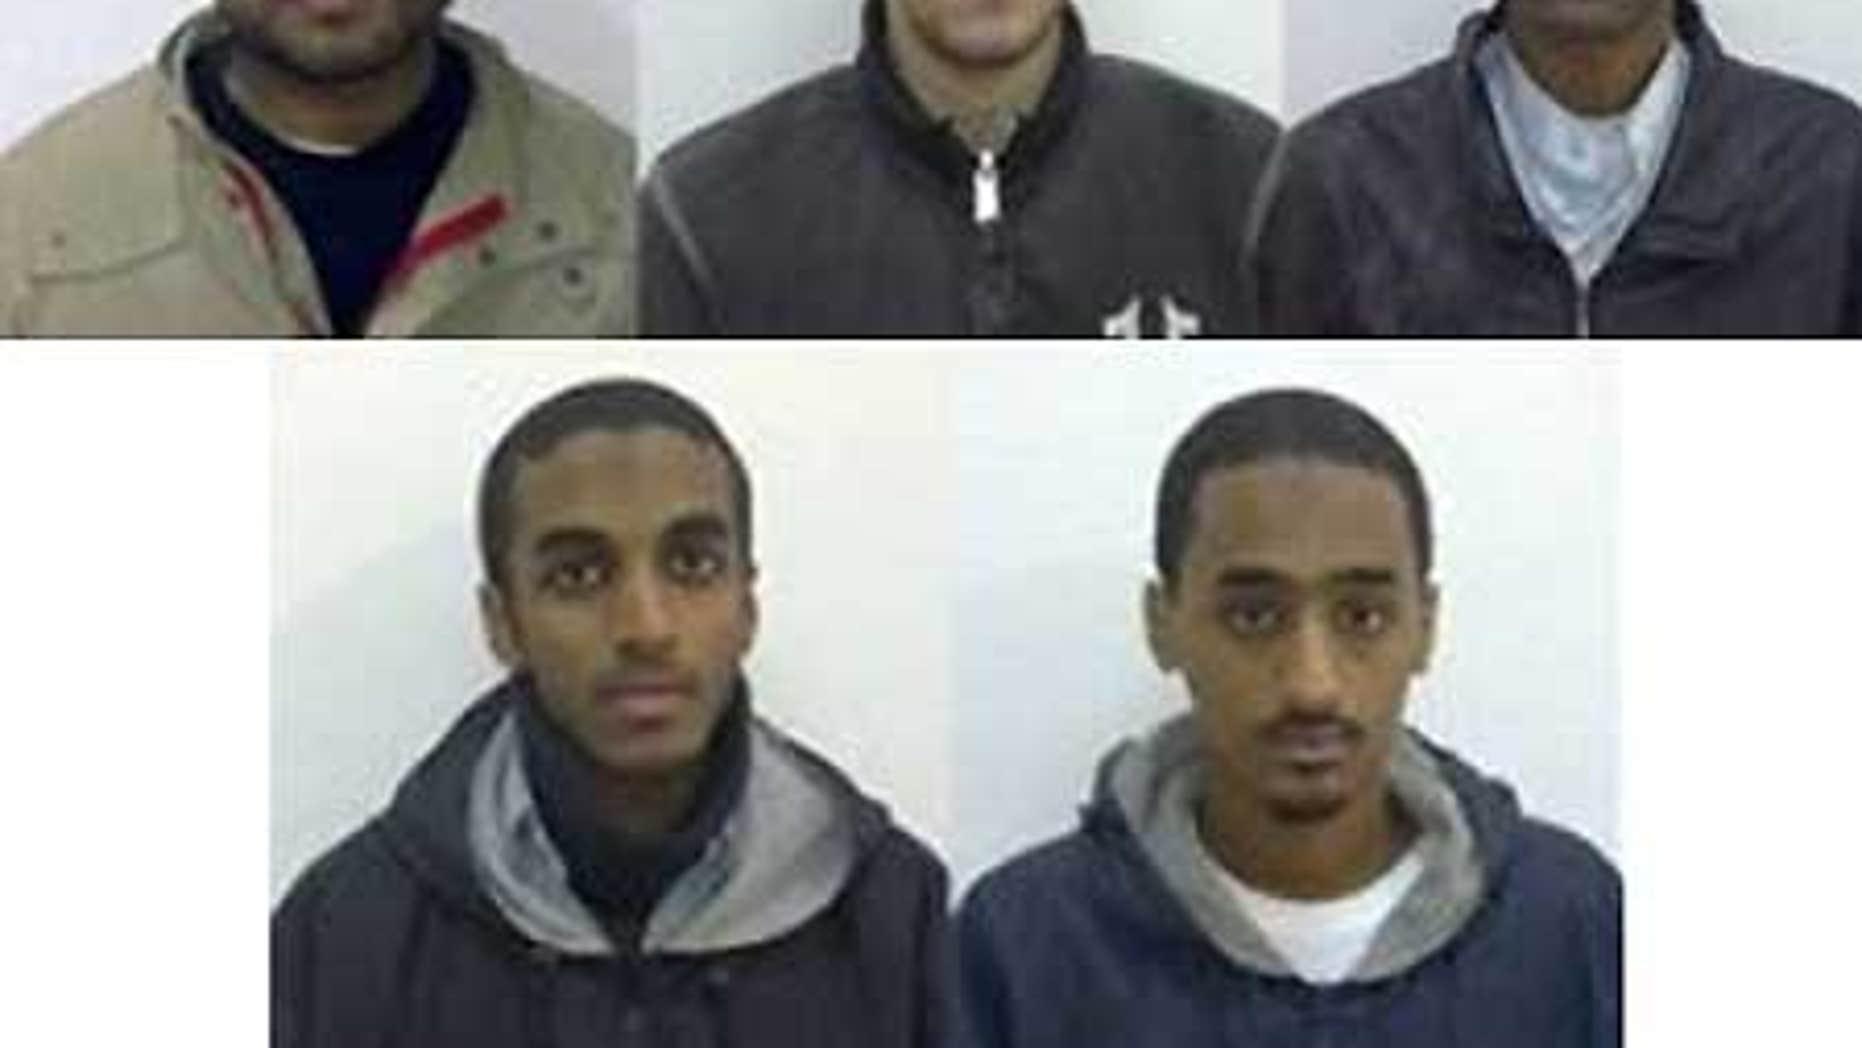 American Muslims, from left, Waqir Hussain Khan, Ramys Zamzam, Umar Farooq, Ahmad Abdulminni, Aman Hasan Yamer.